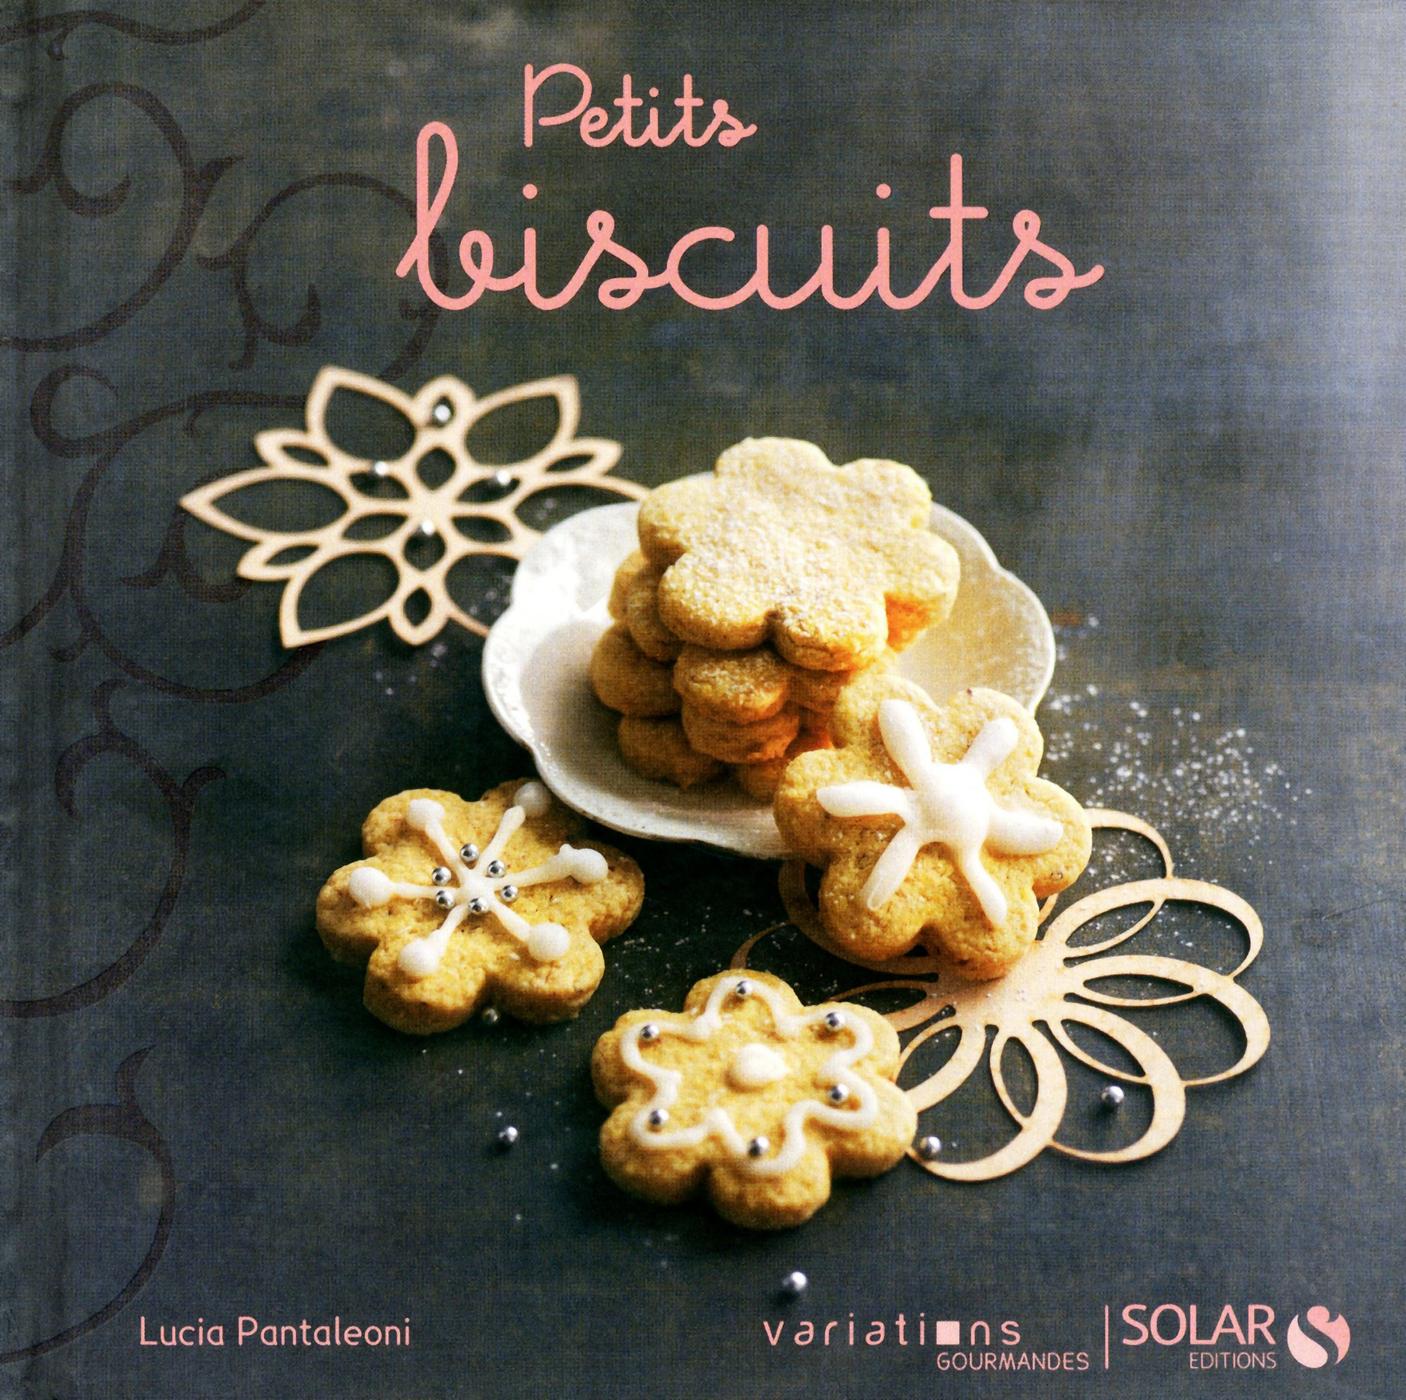 Petits biscuits - Variations Gourmandes (ebook)